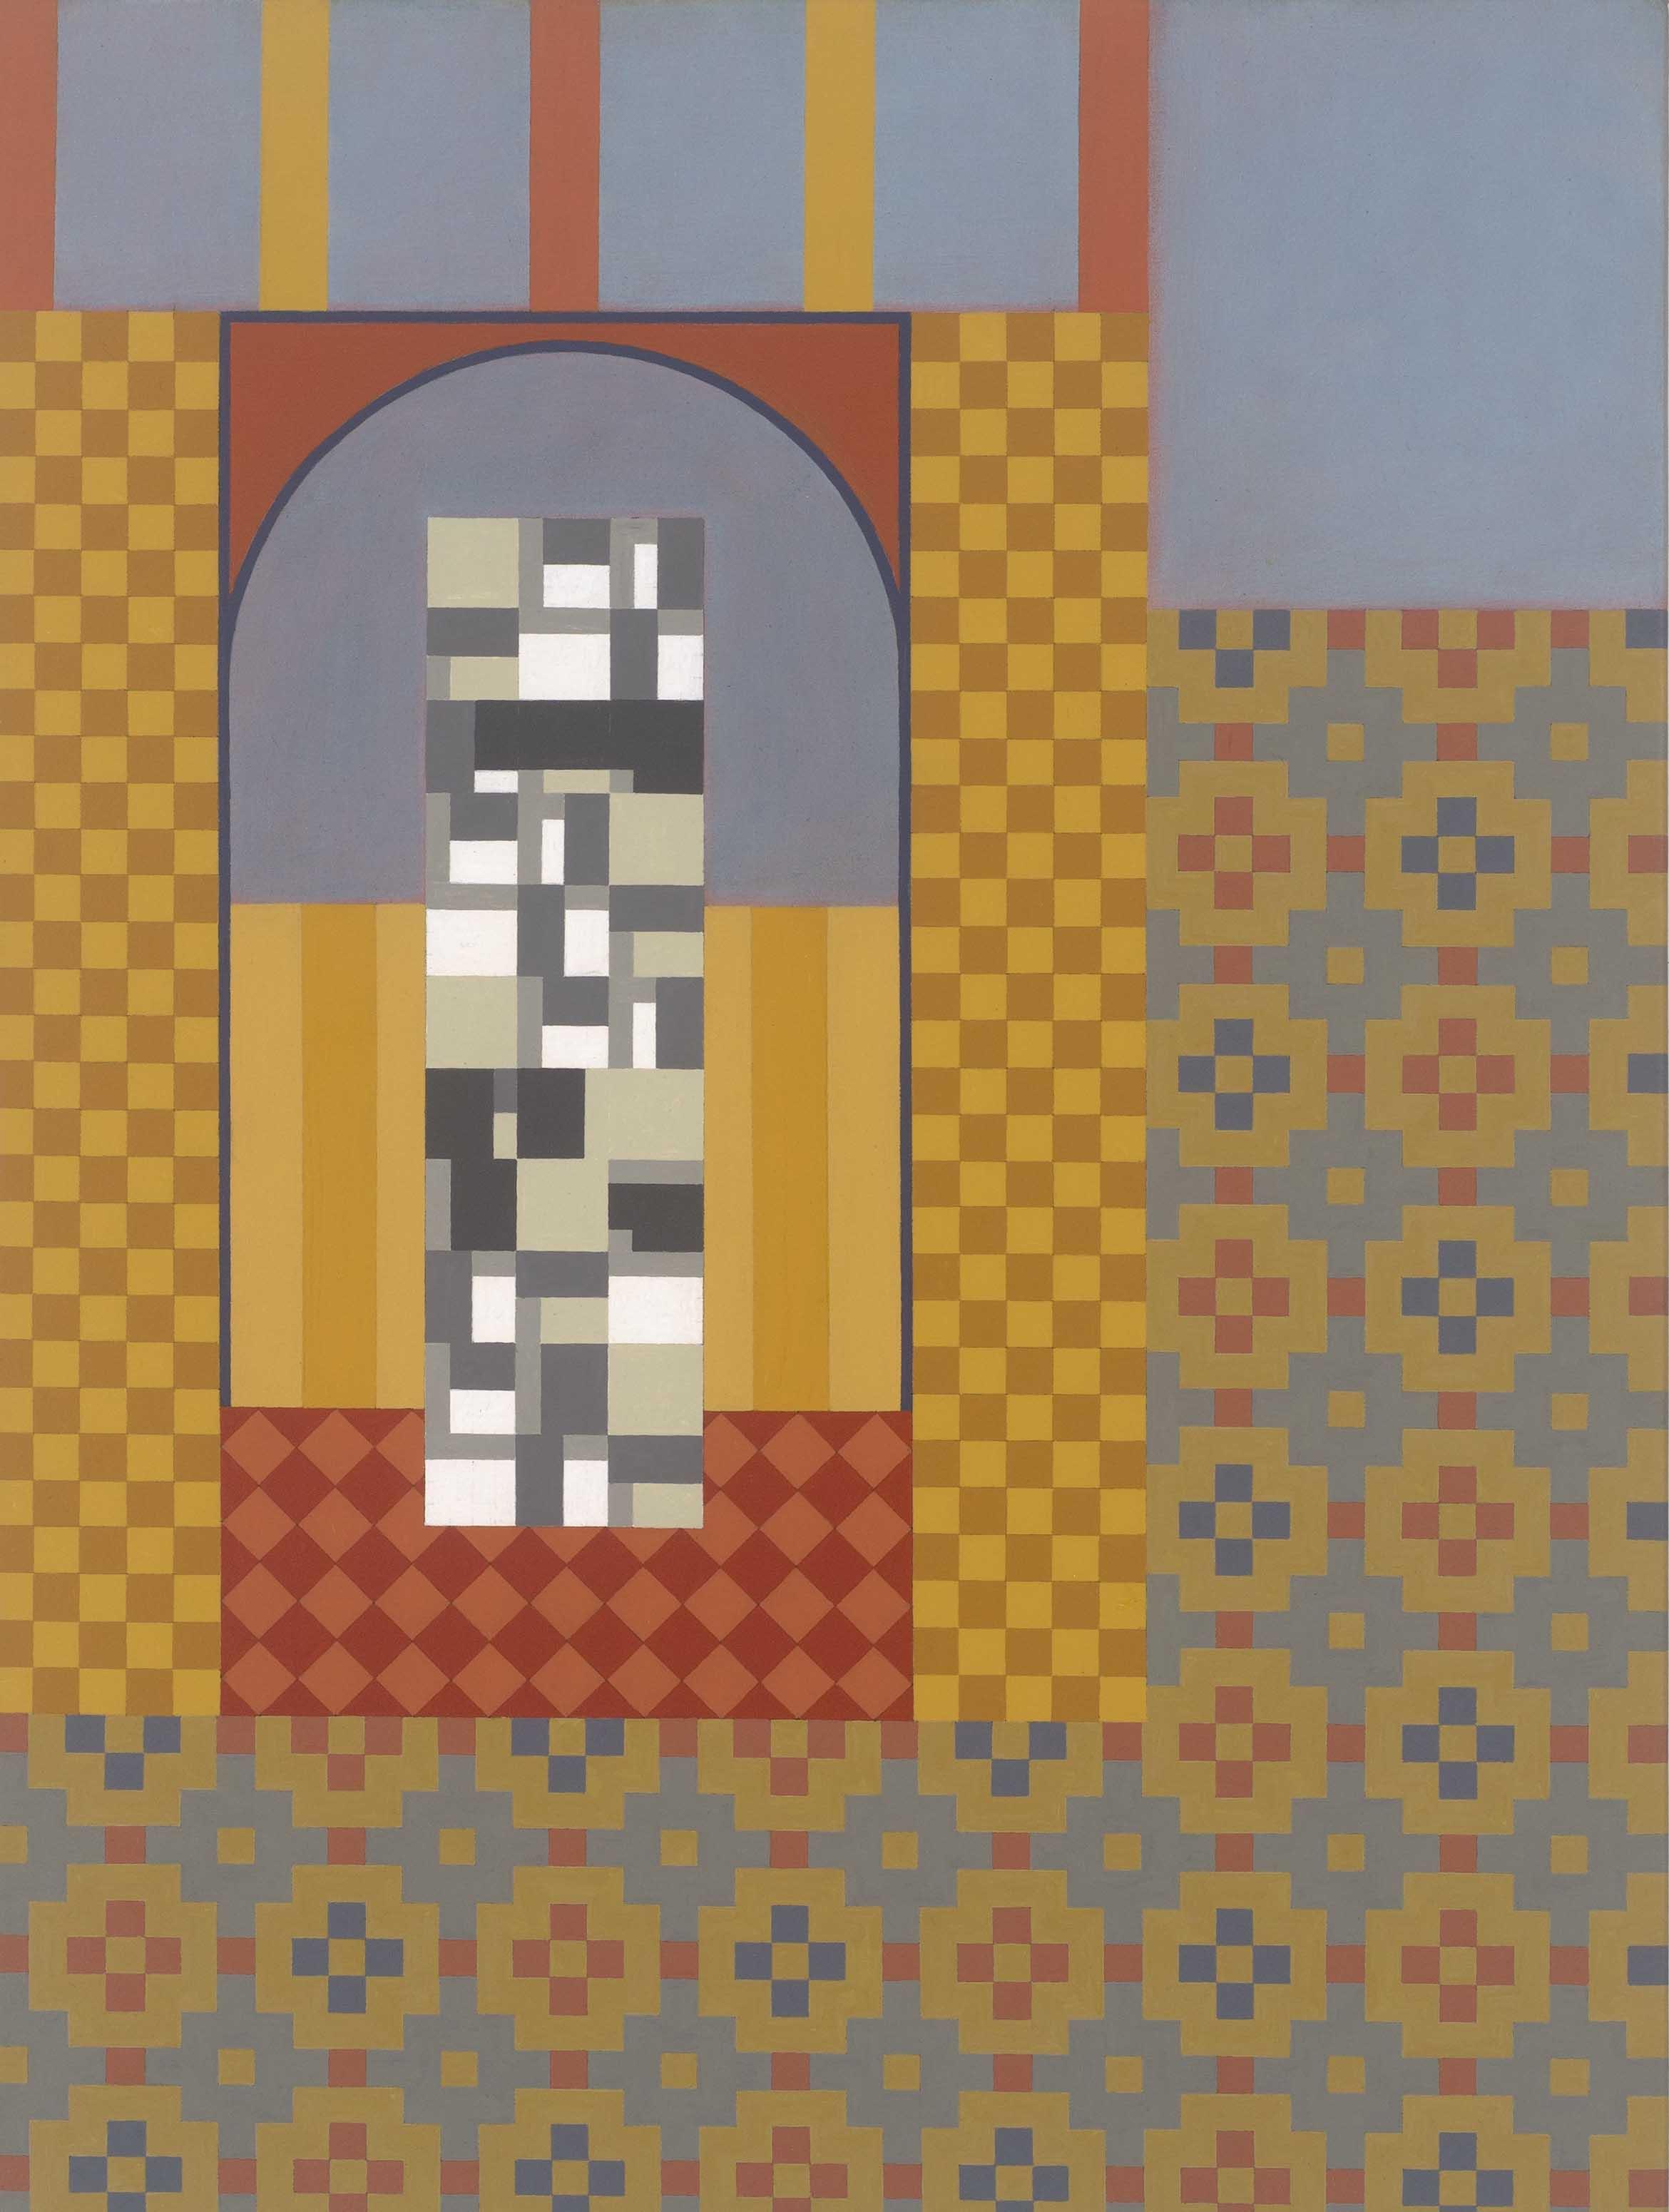 Origin of Reason, 2017. acrylic on canvas, 60.5 x 45.5cm, $3,300